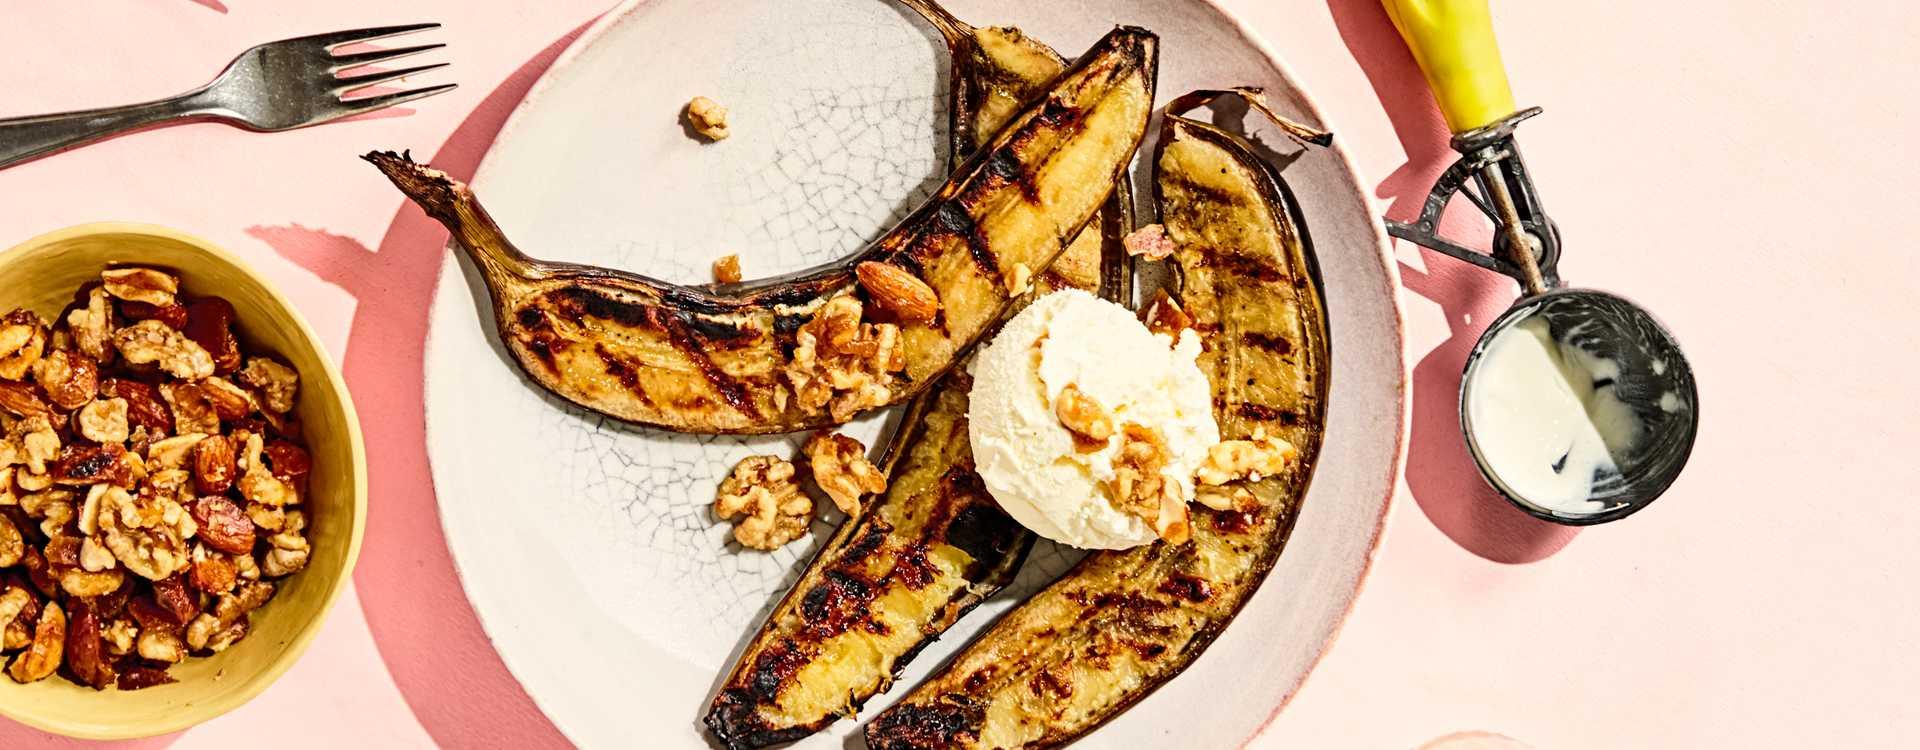 Grillede bananer med is og karamelliserte nøtter